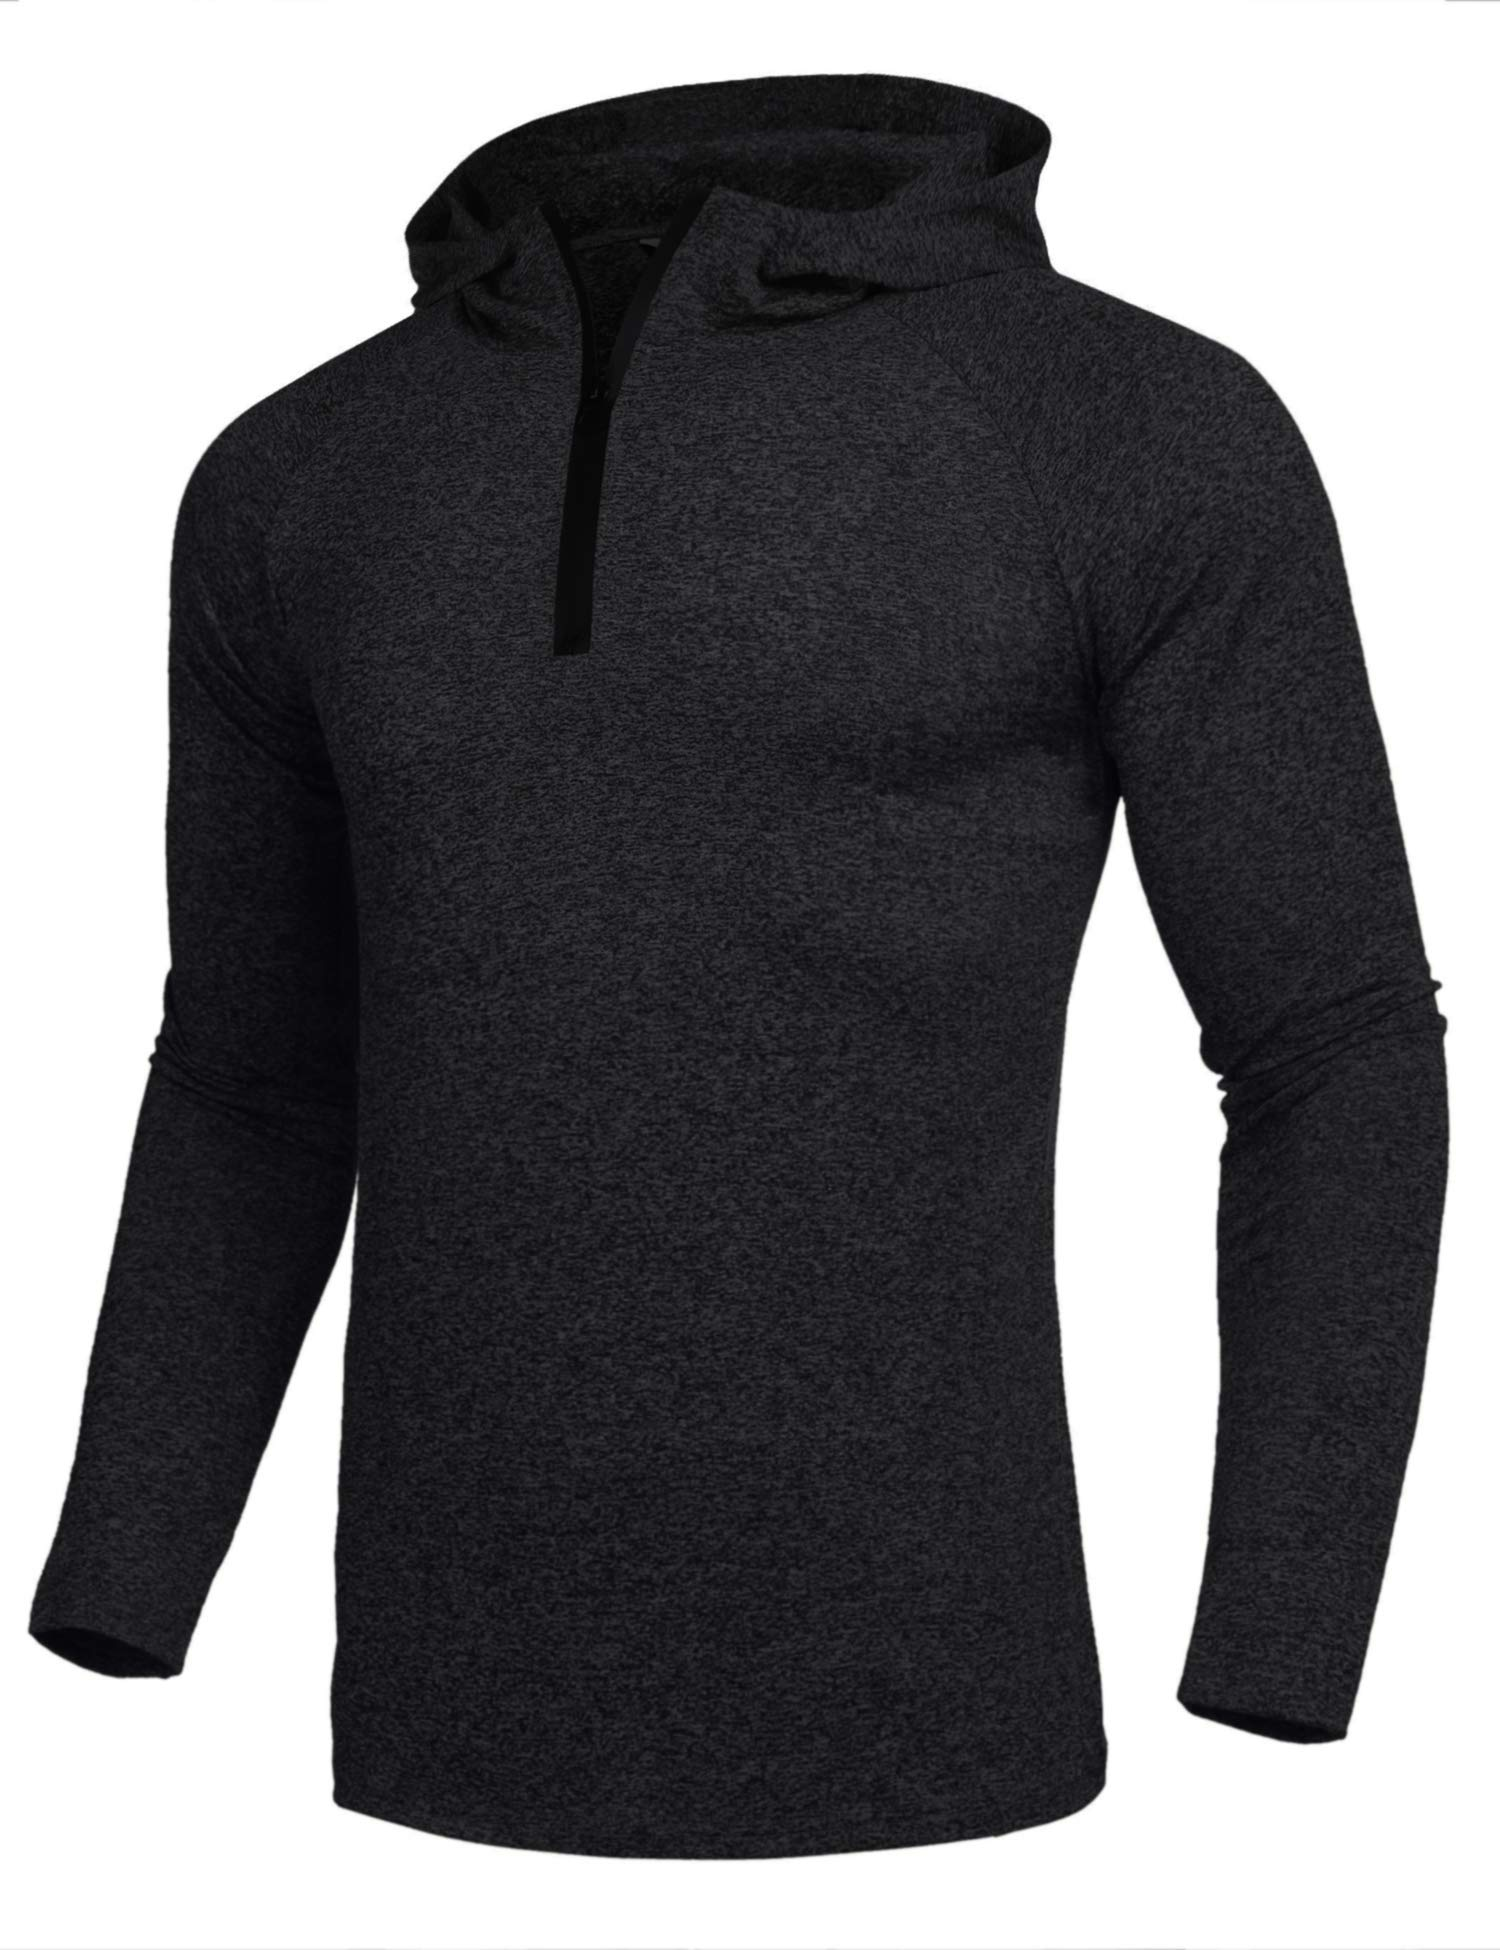 COOFANDY Mens Quarter Zip Cycling Jersey Long Sleeve Hooded